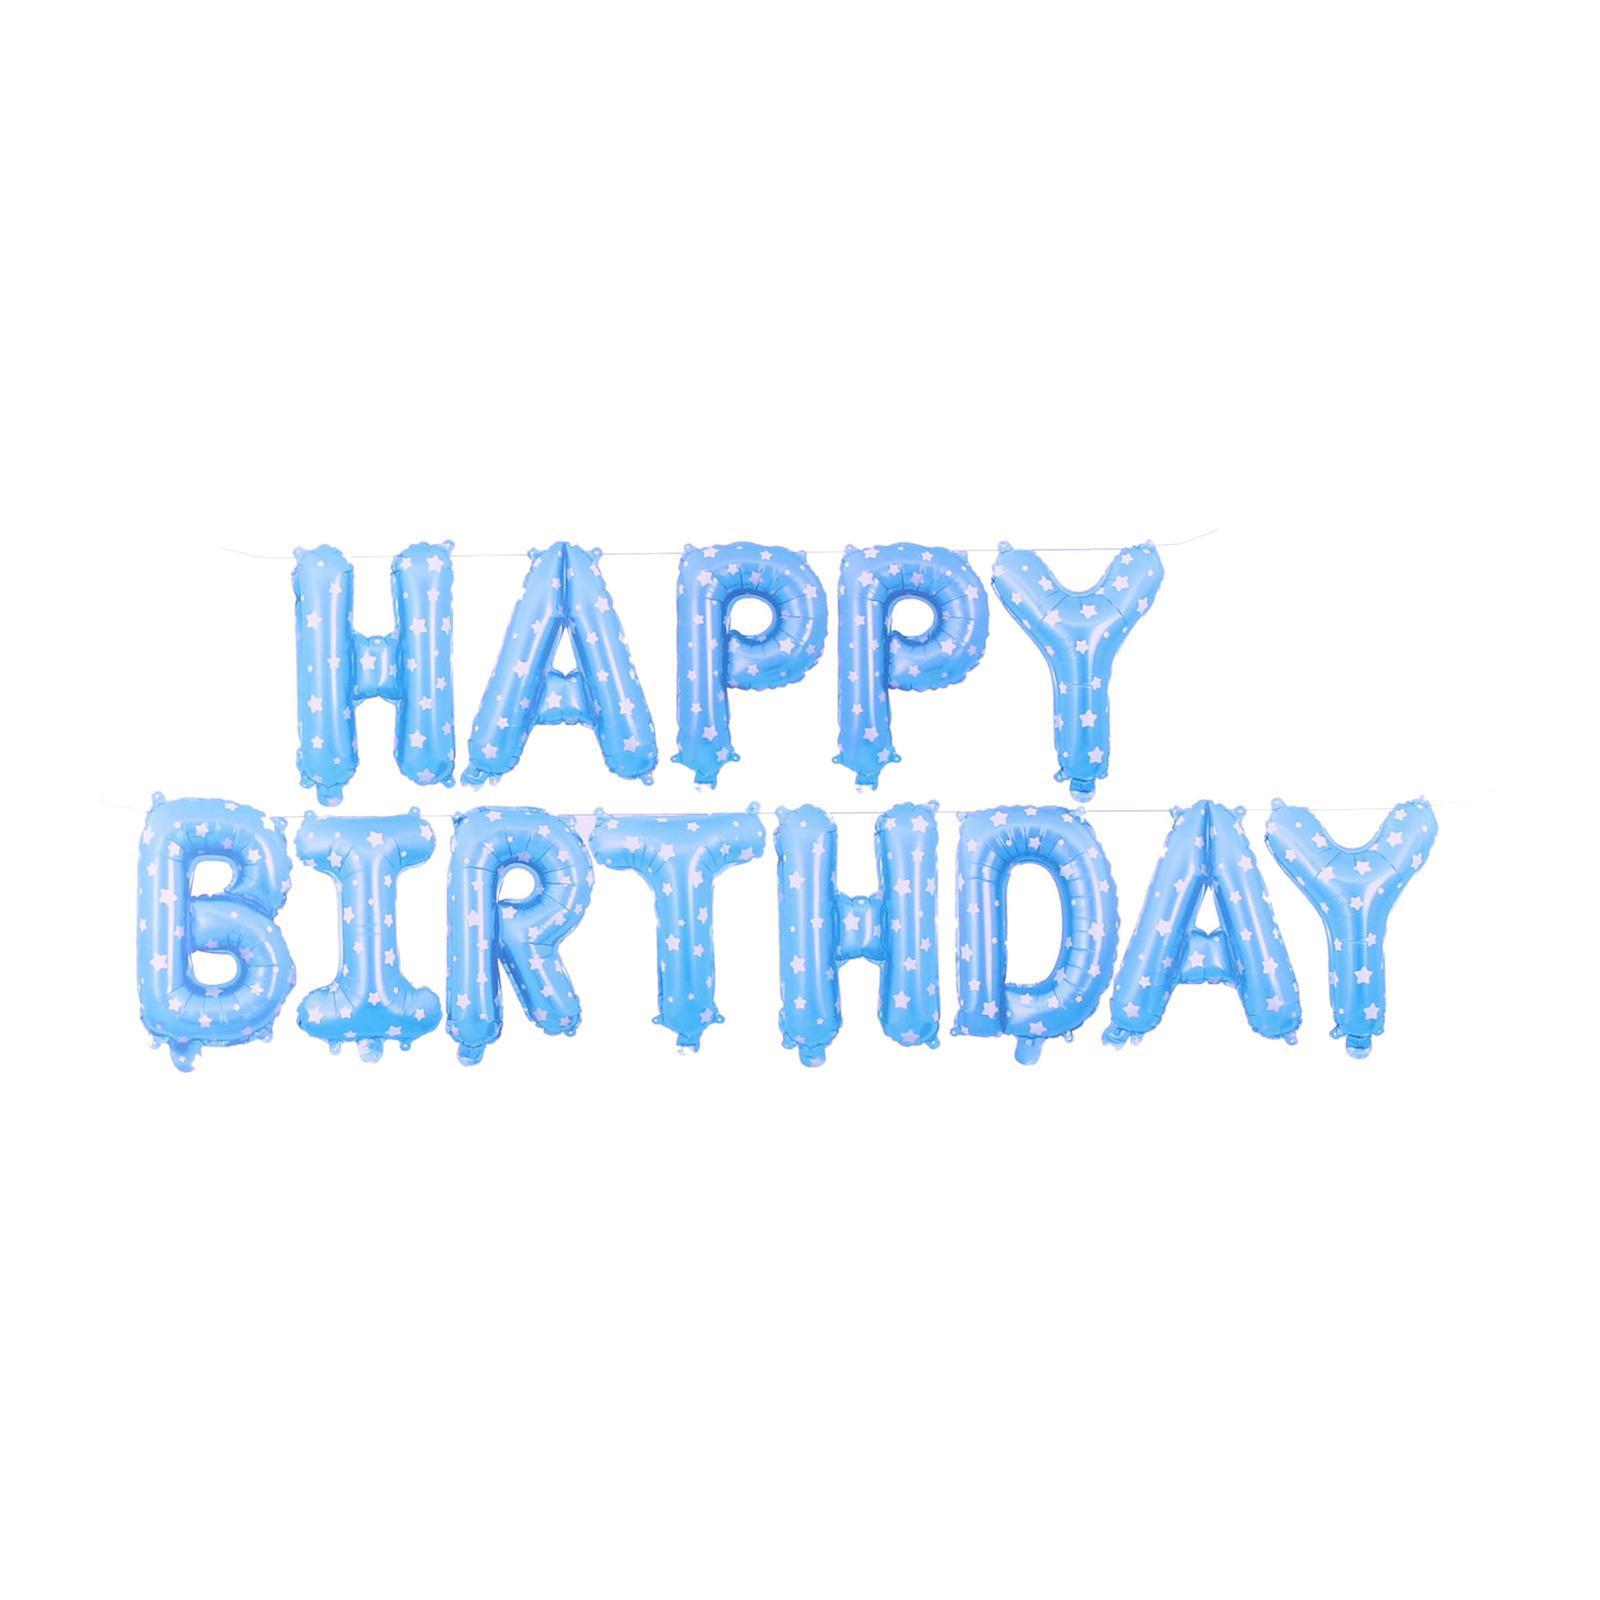 Partyforte Happy Birthday Airfilled Balloon - Blue Polka Dots (16 Inch)